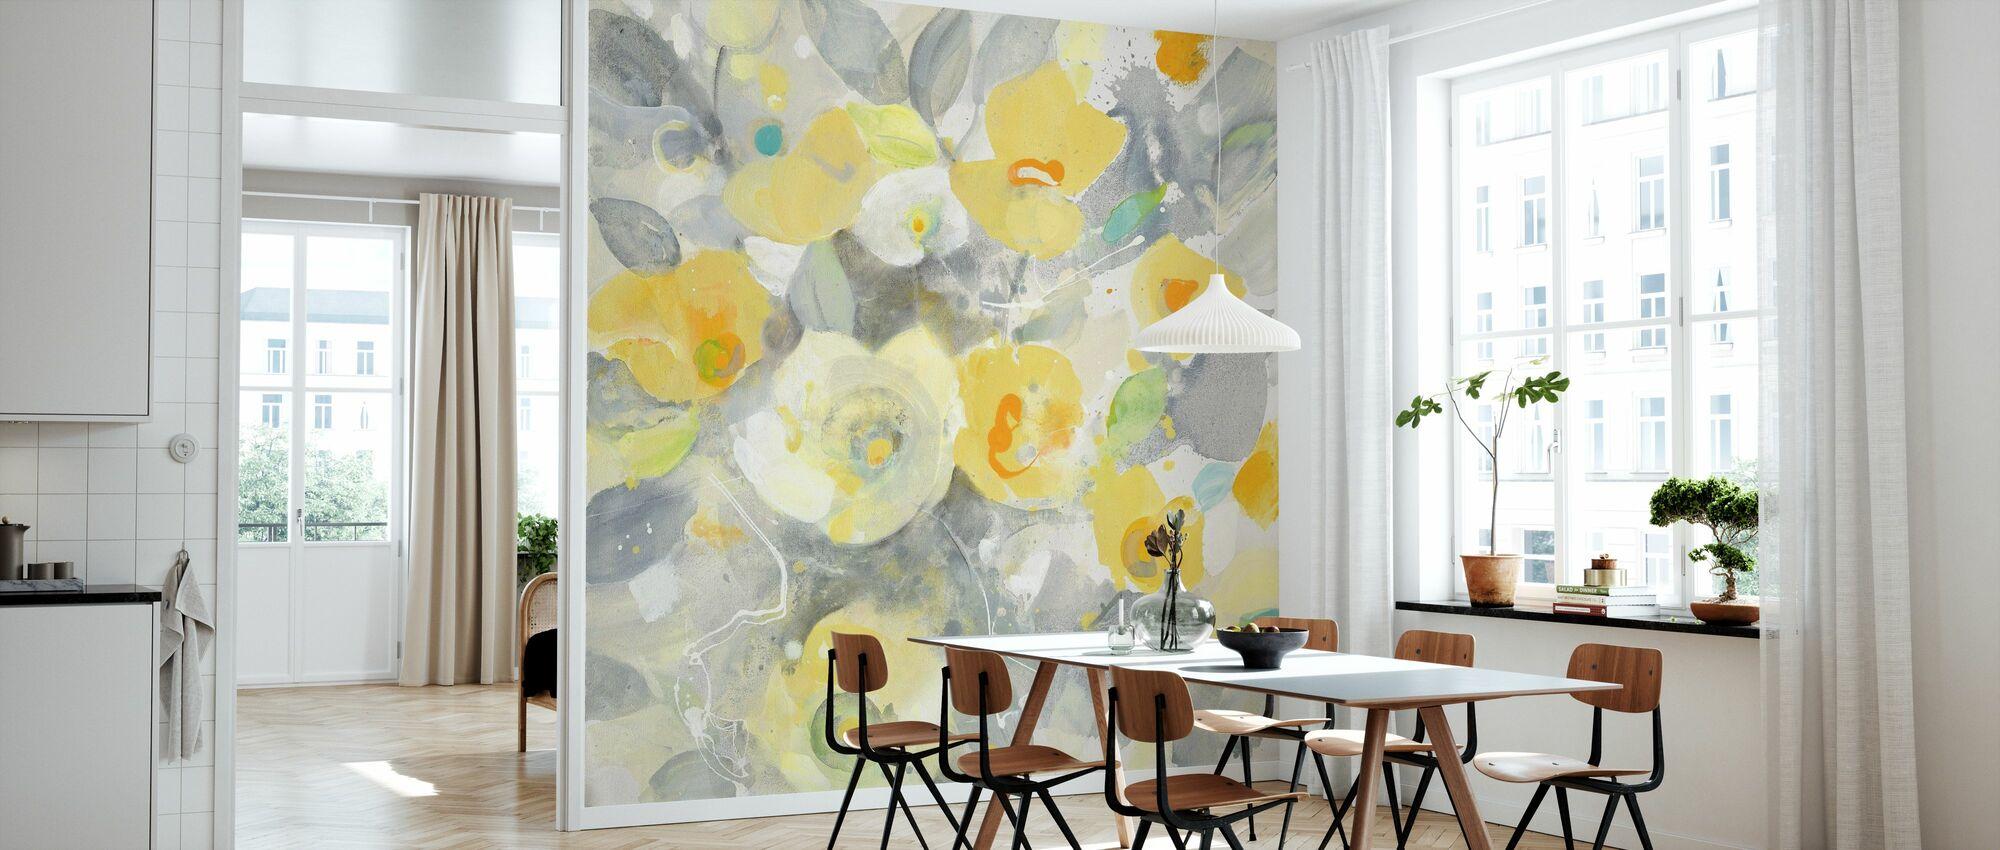 Buttercups II - Wallpaper - Kitchen